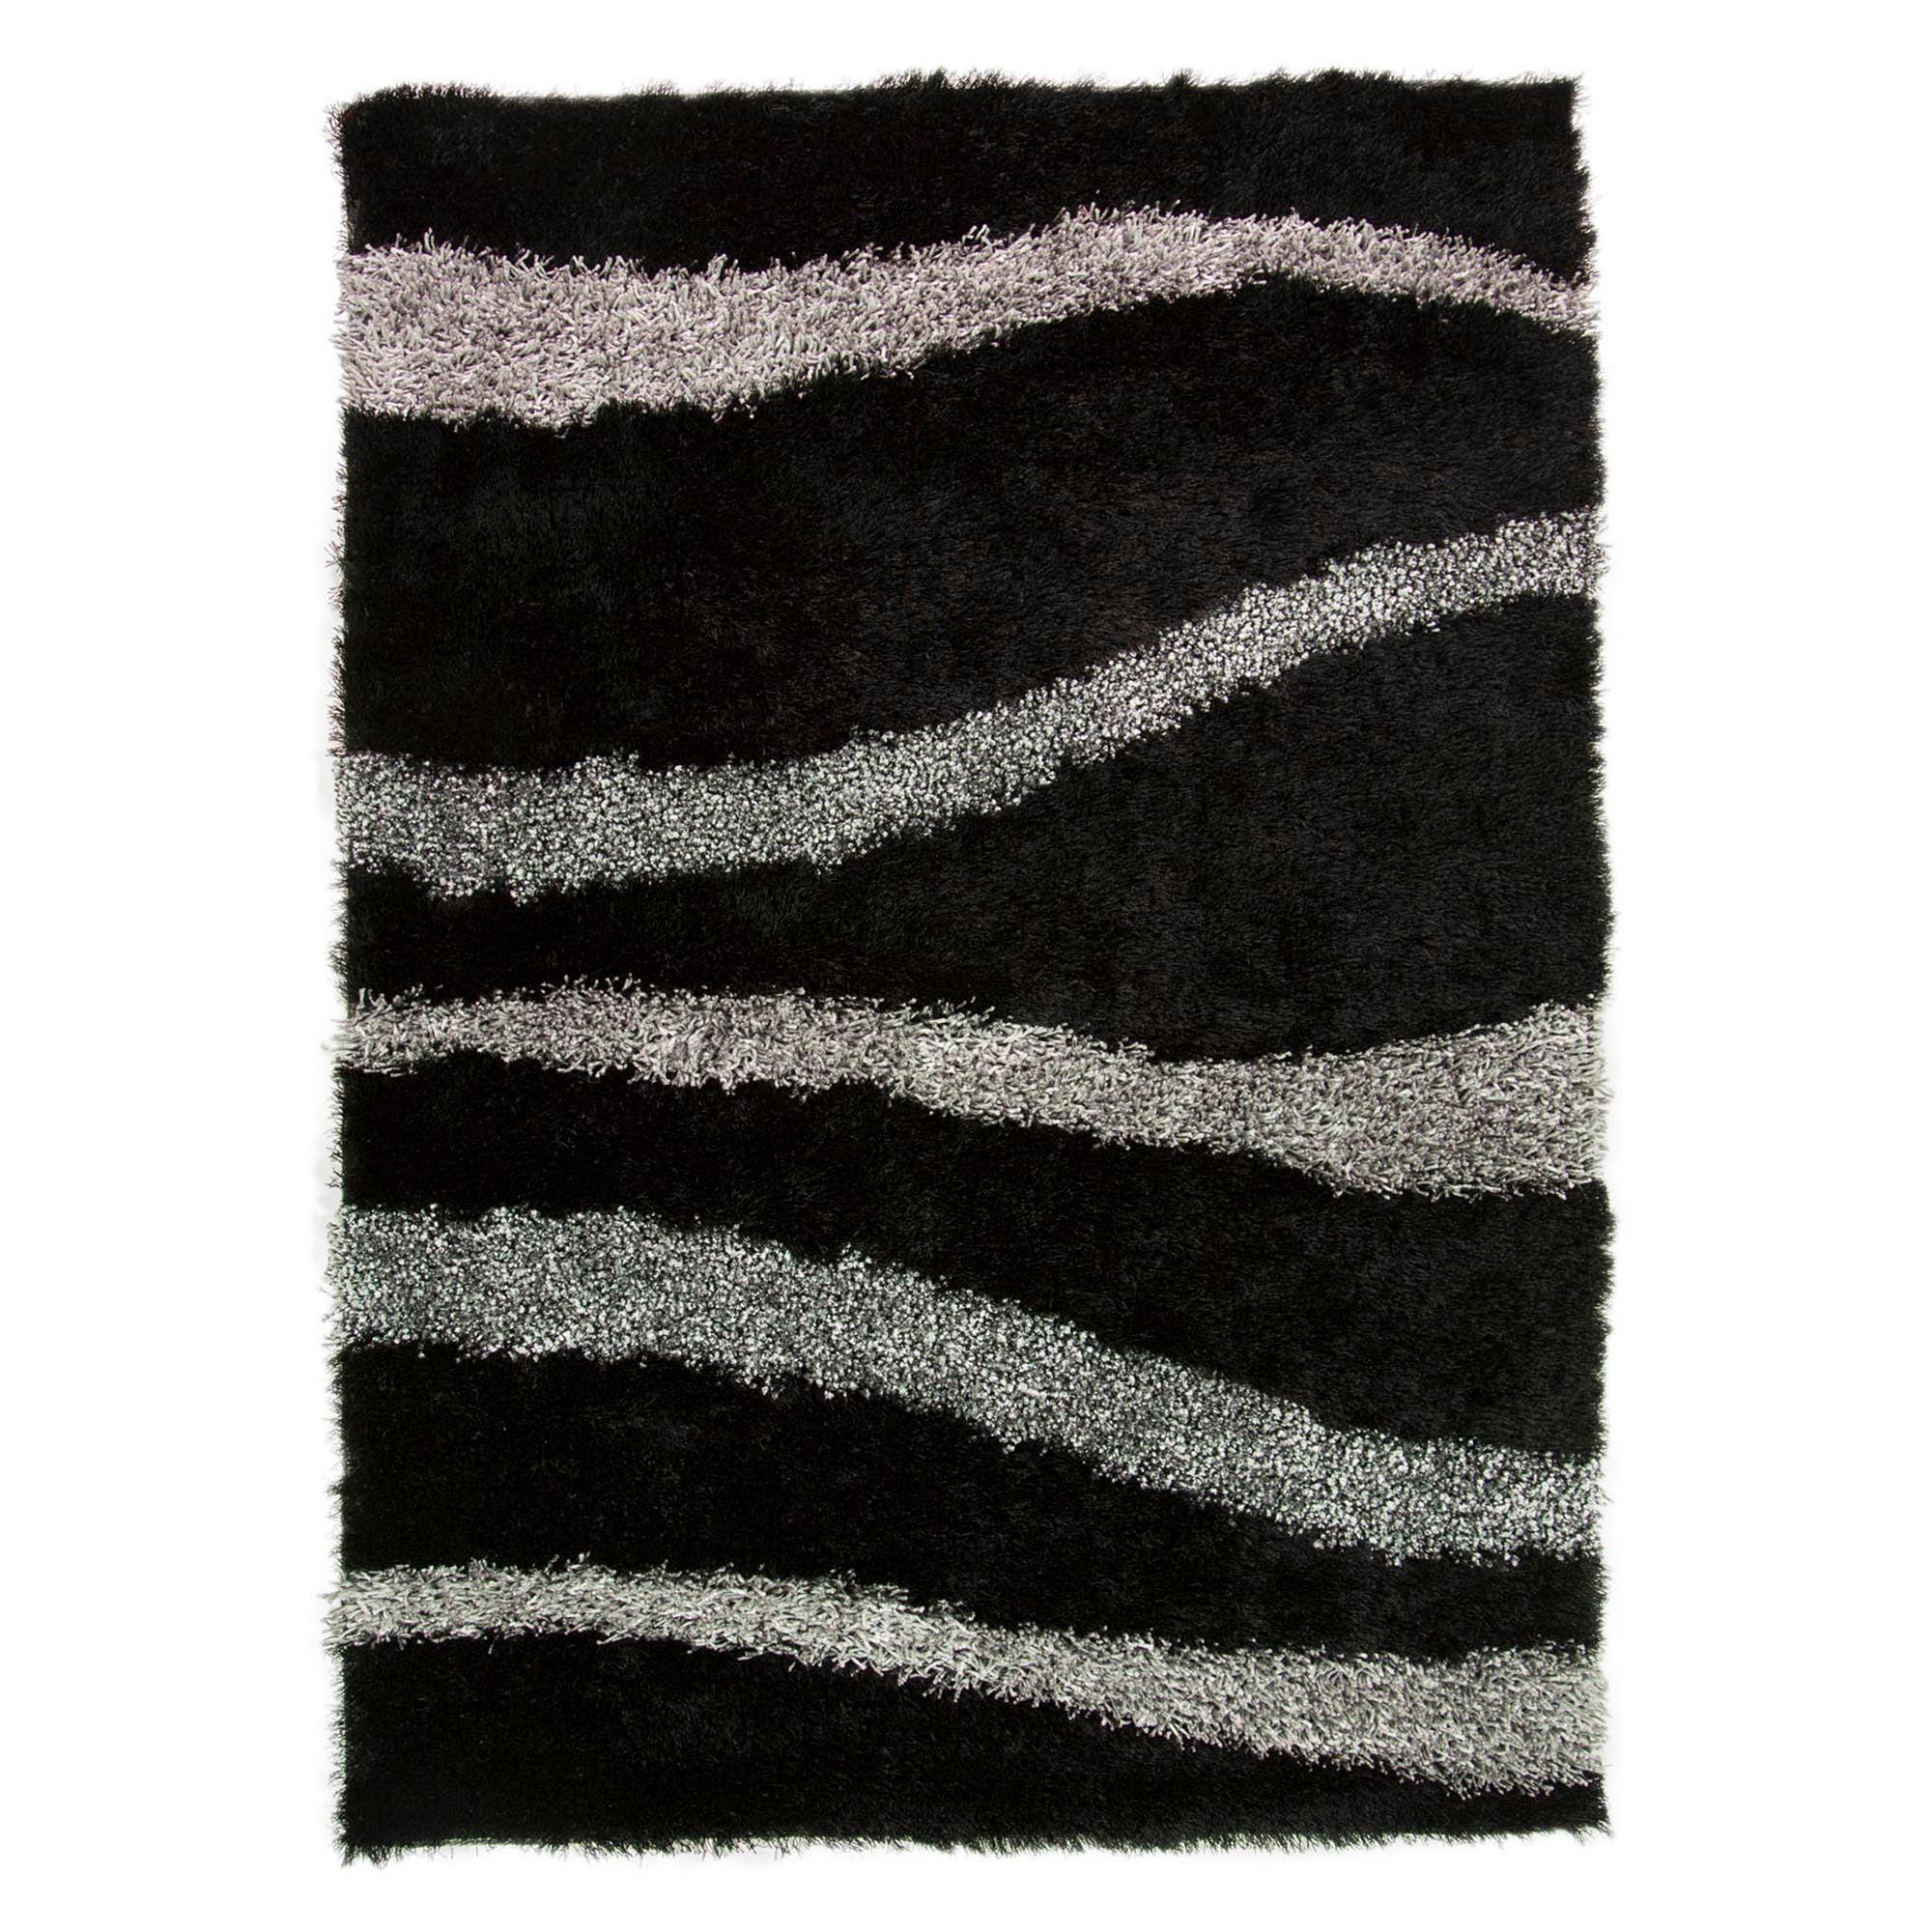 dunelms rugs home decor. Black Bedroom Furniture Sets. Home Design Ideas